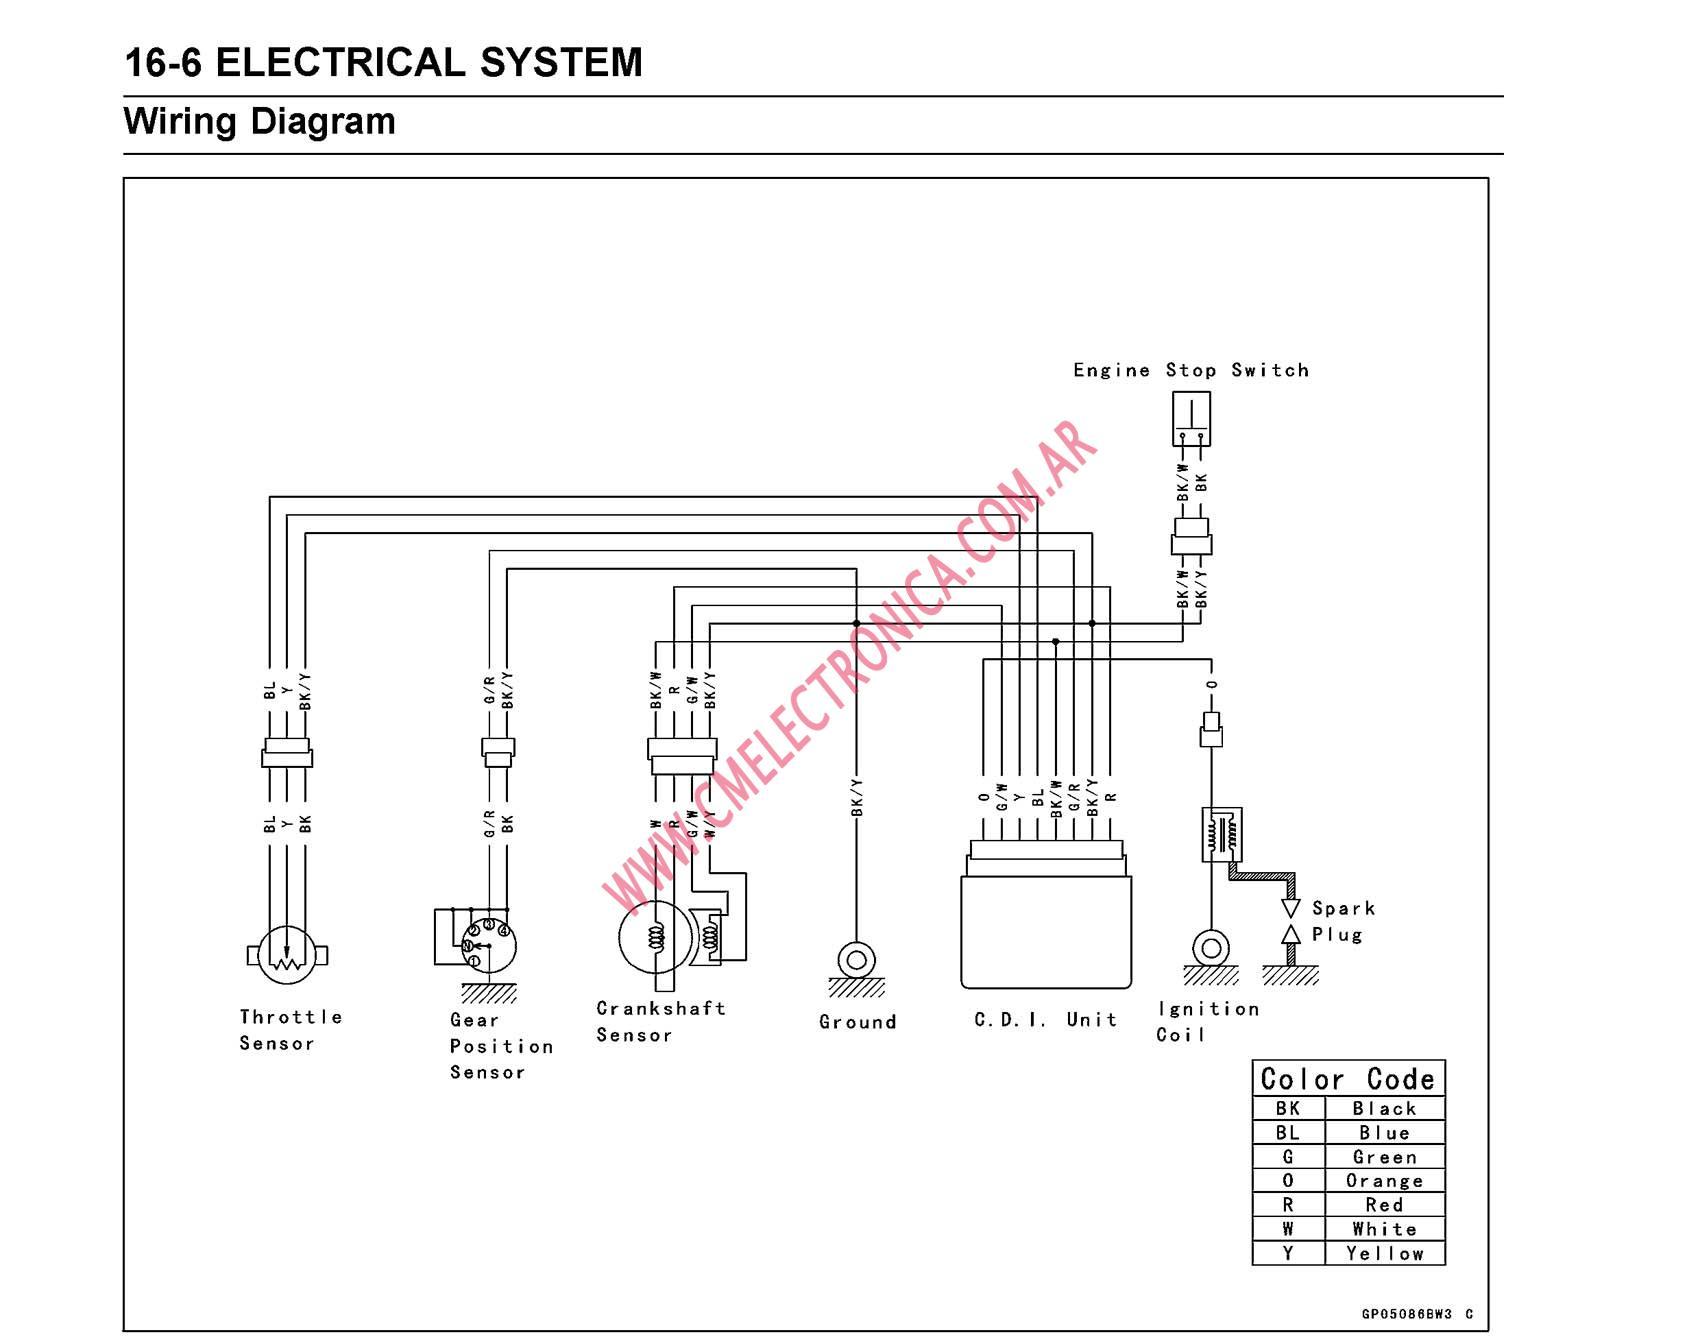 kx 80 wiring diagram wiring diagram third level Kawasaki Kx80 Wiring Diagram